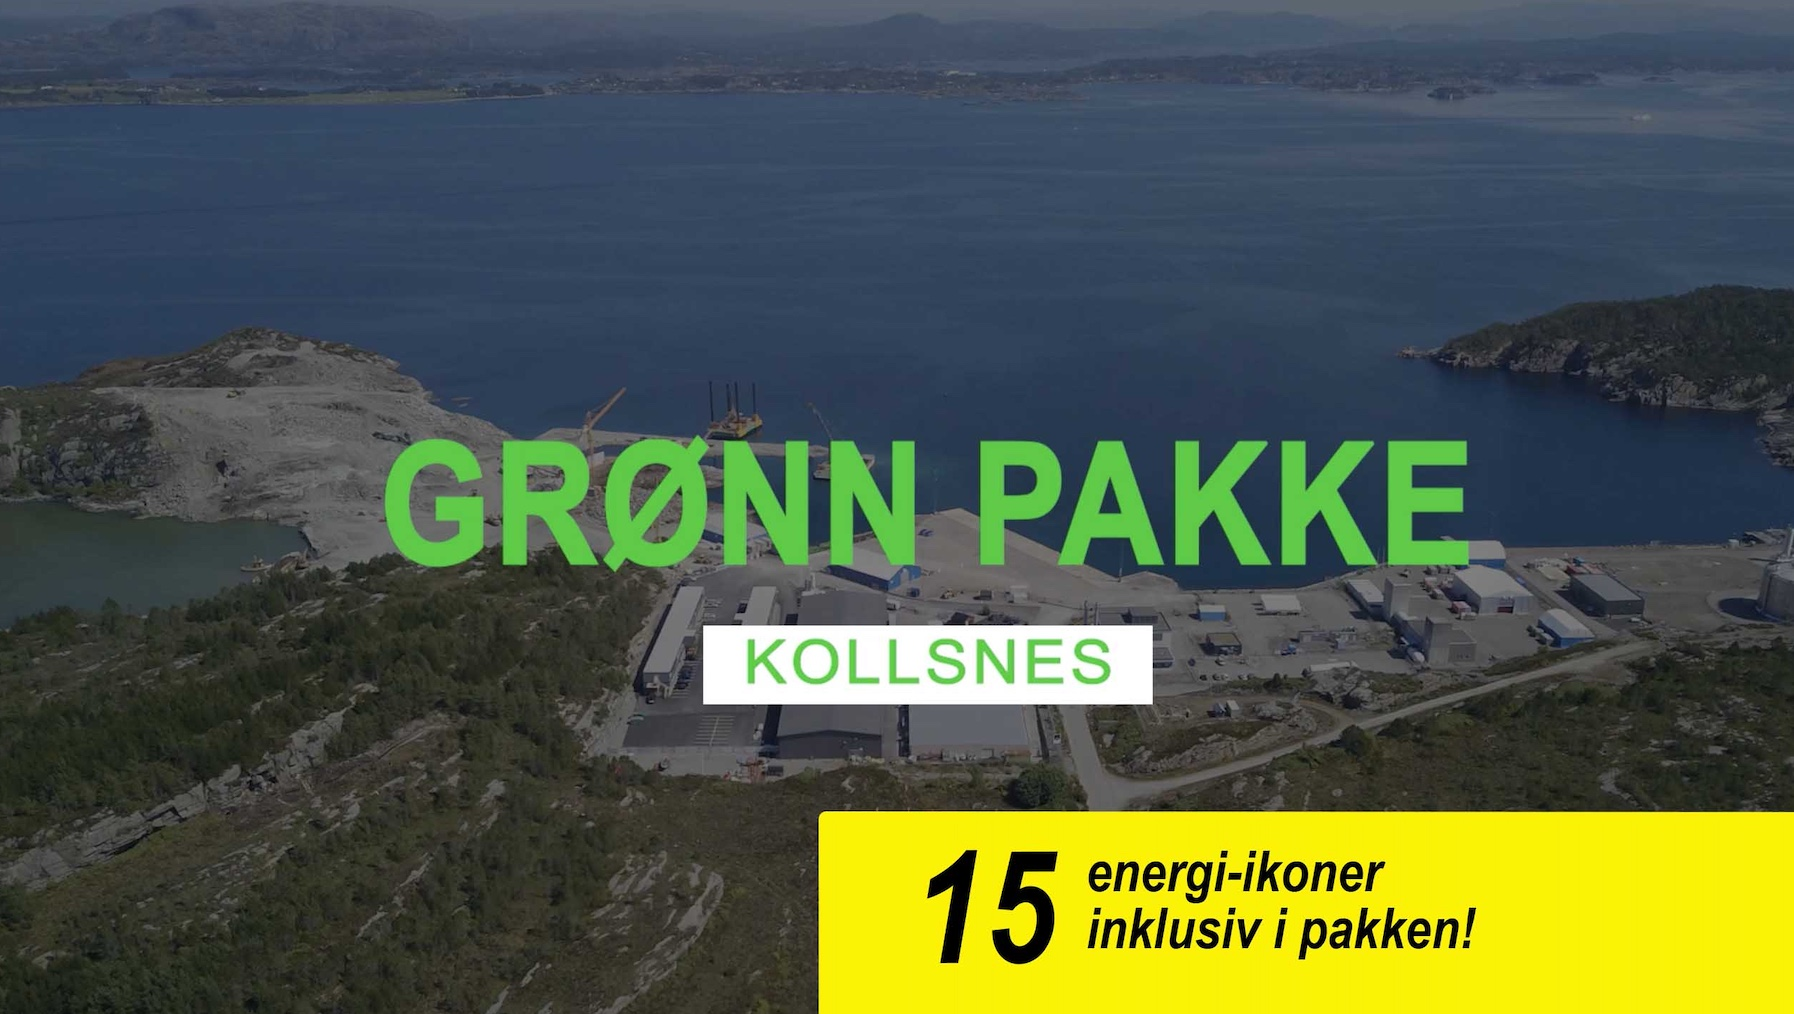 Studio Vestland - Grønn pakke Kollsnes